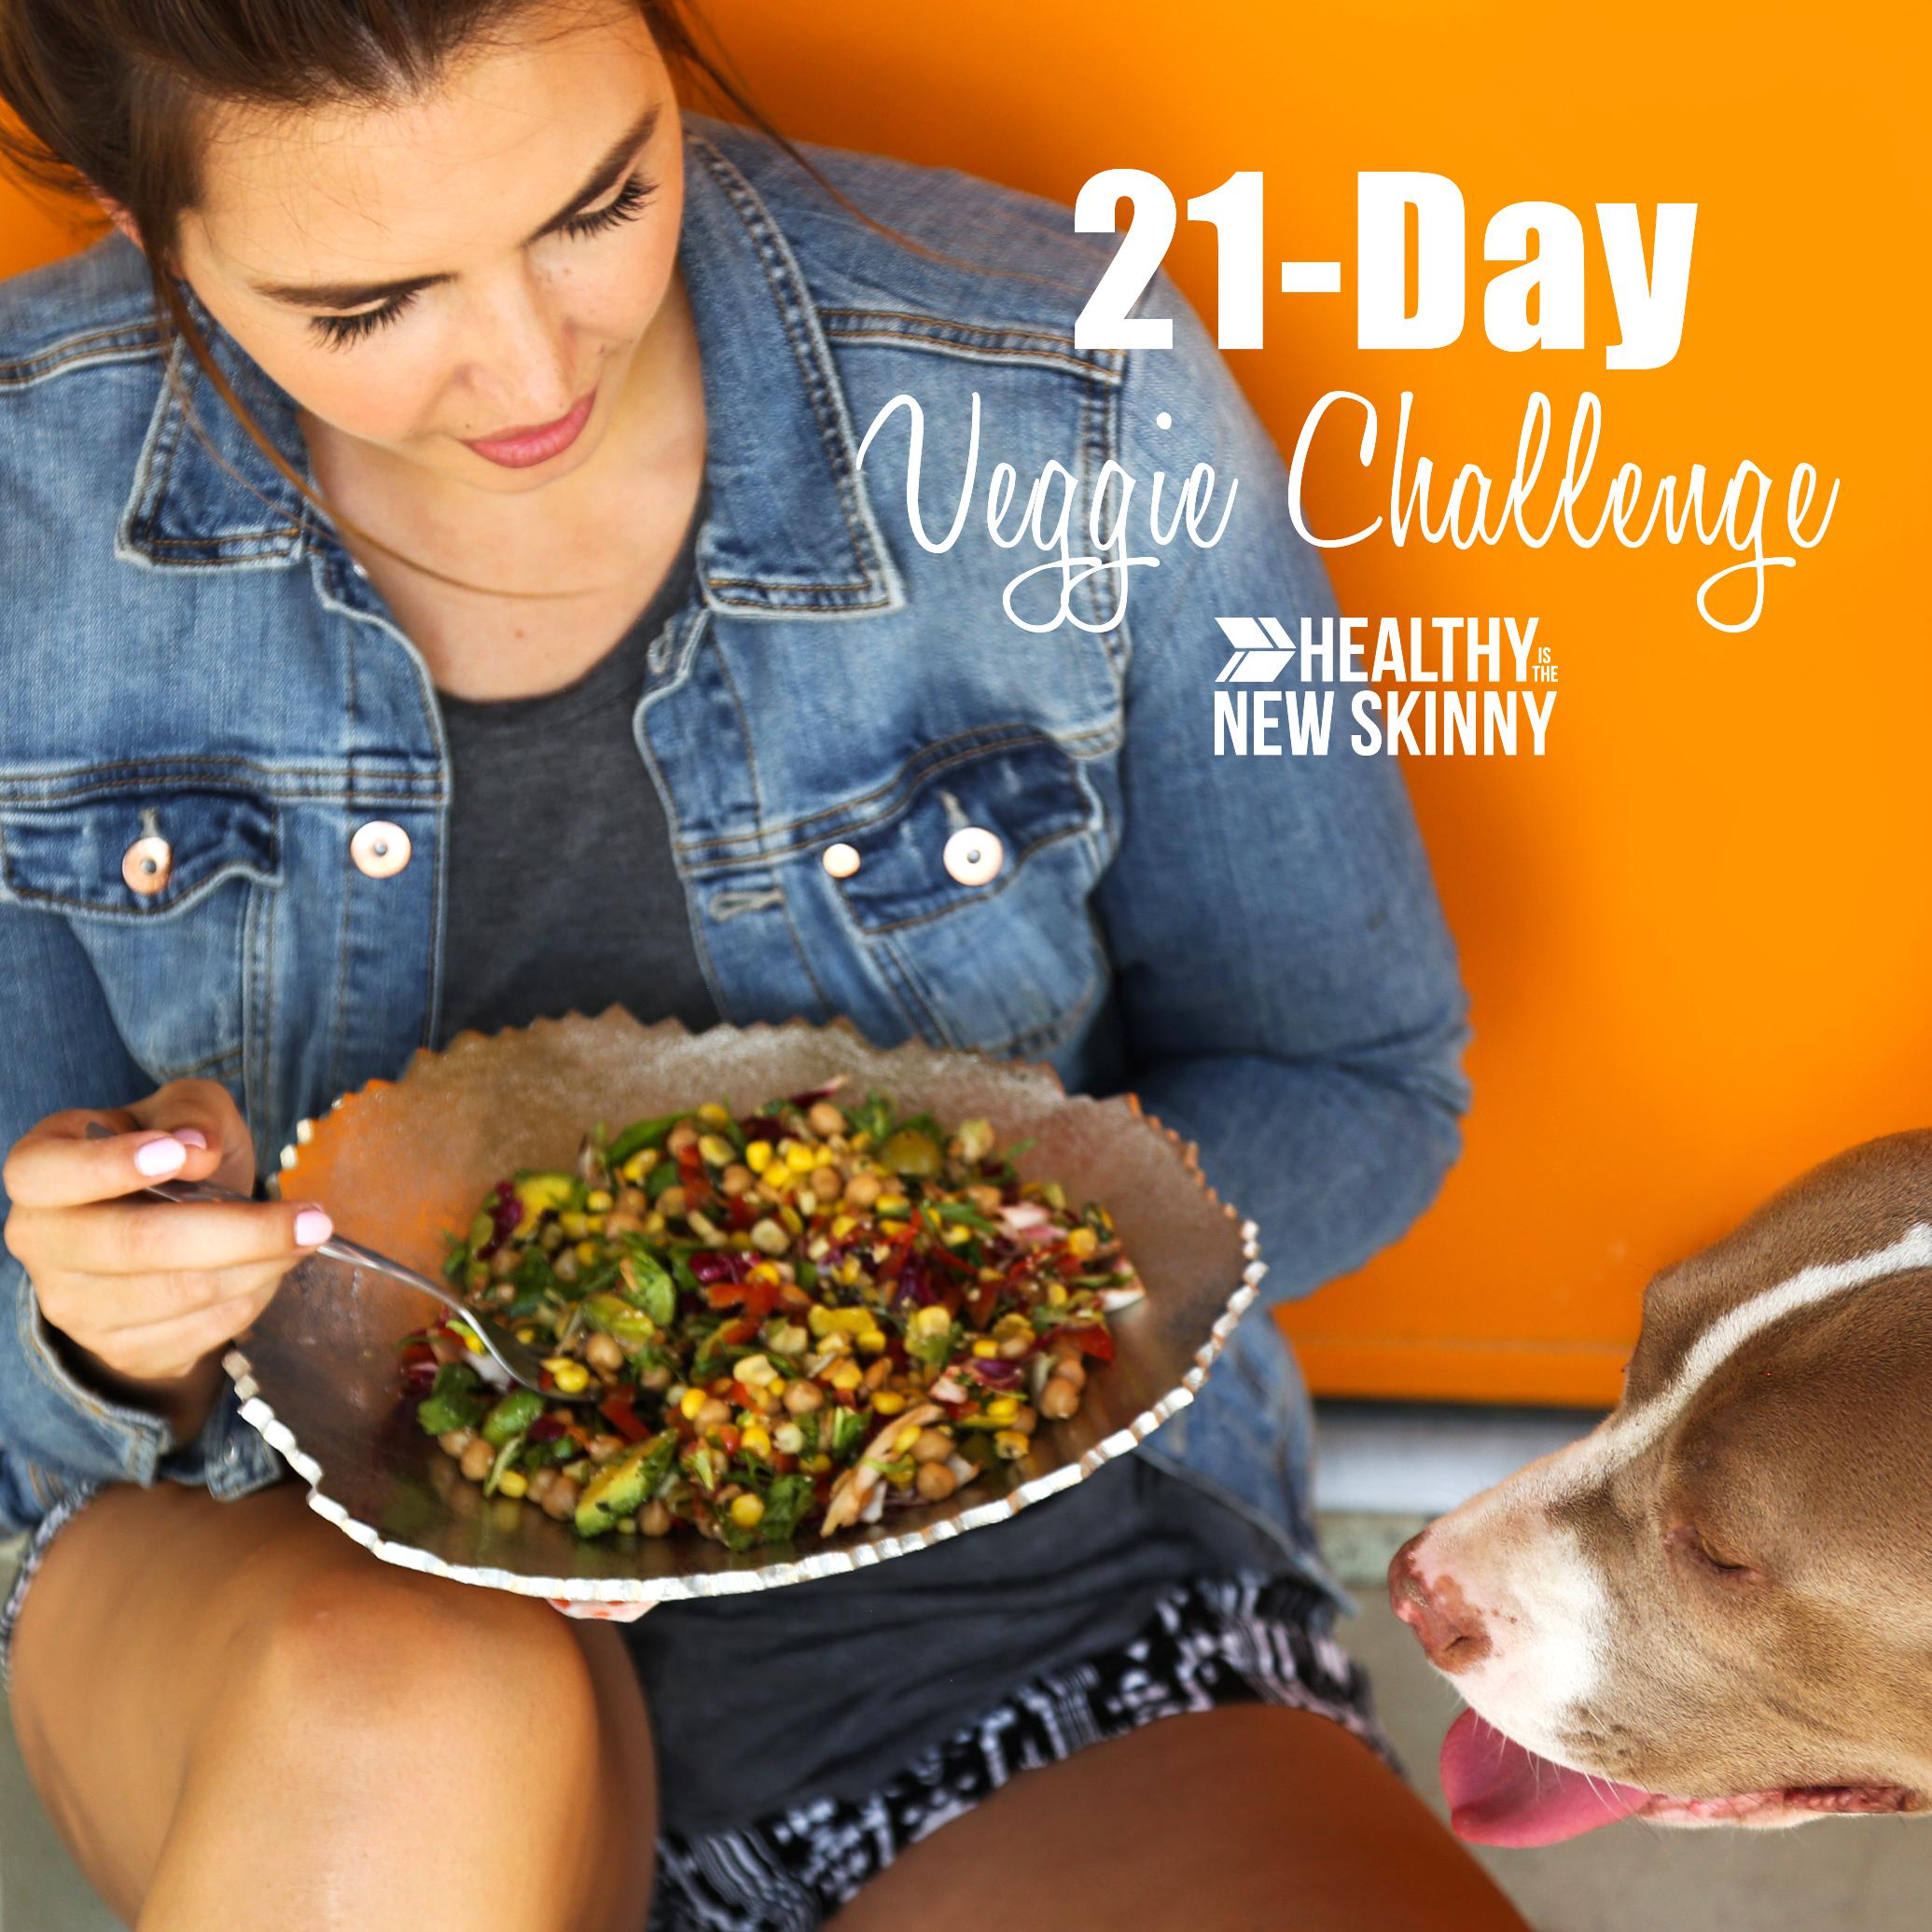 veggie challenge.jpg